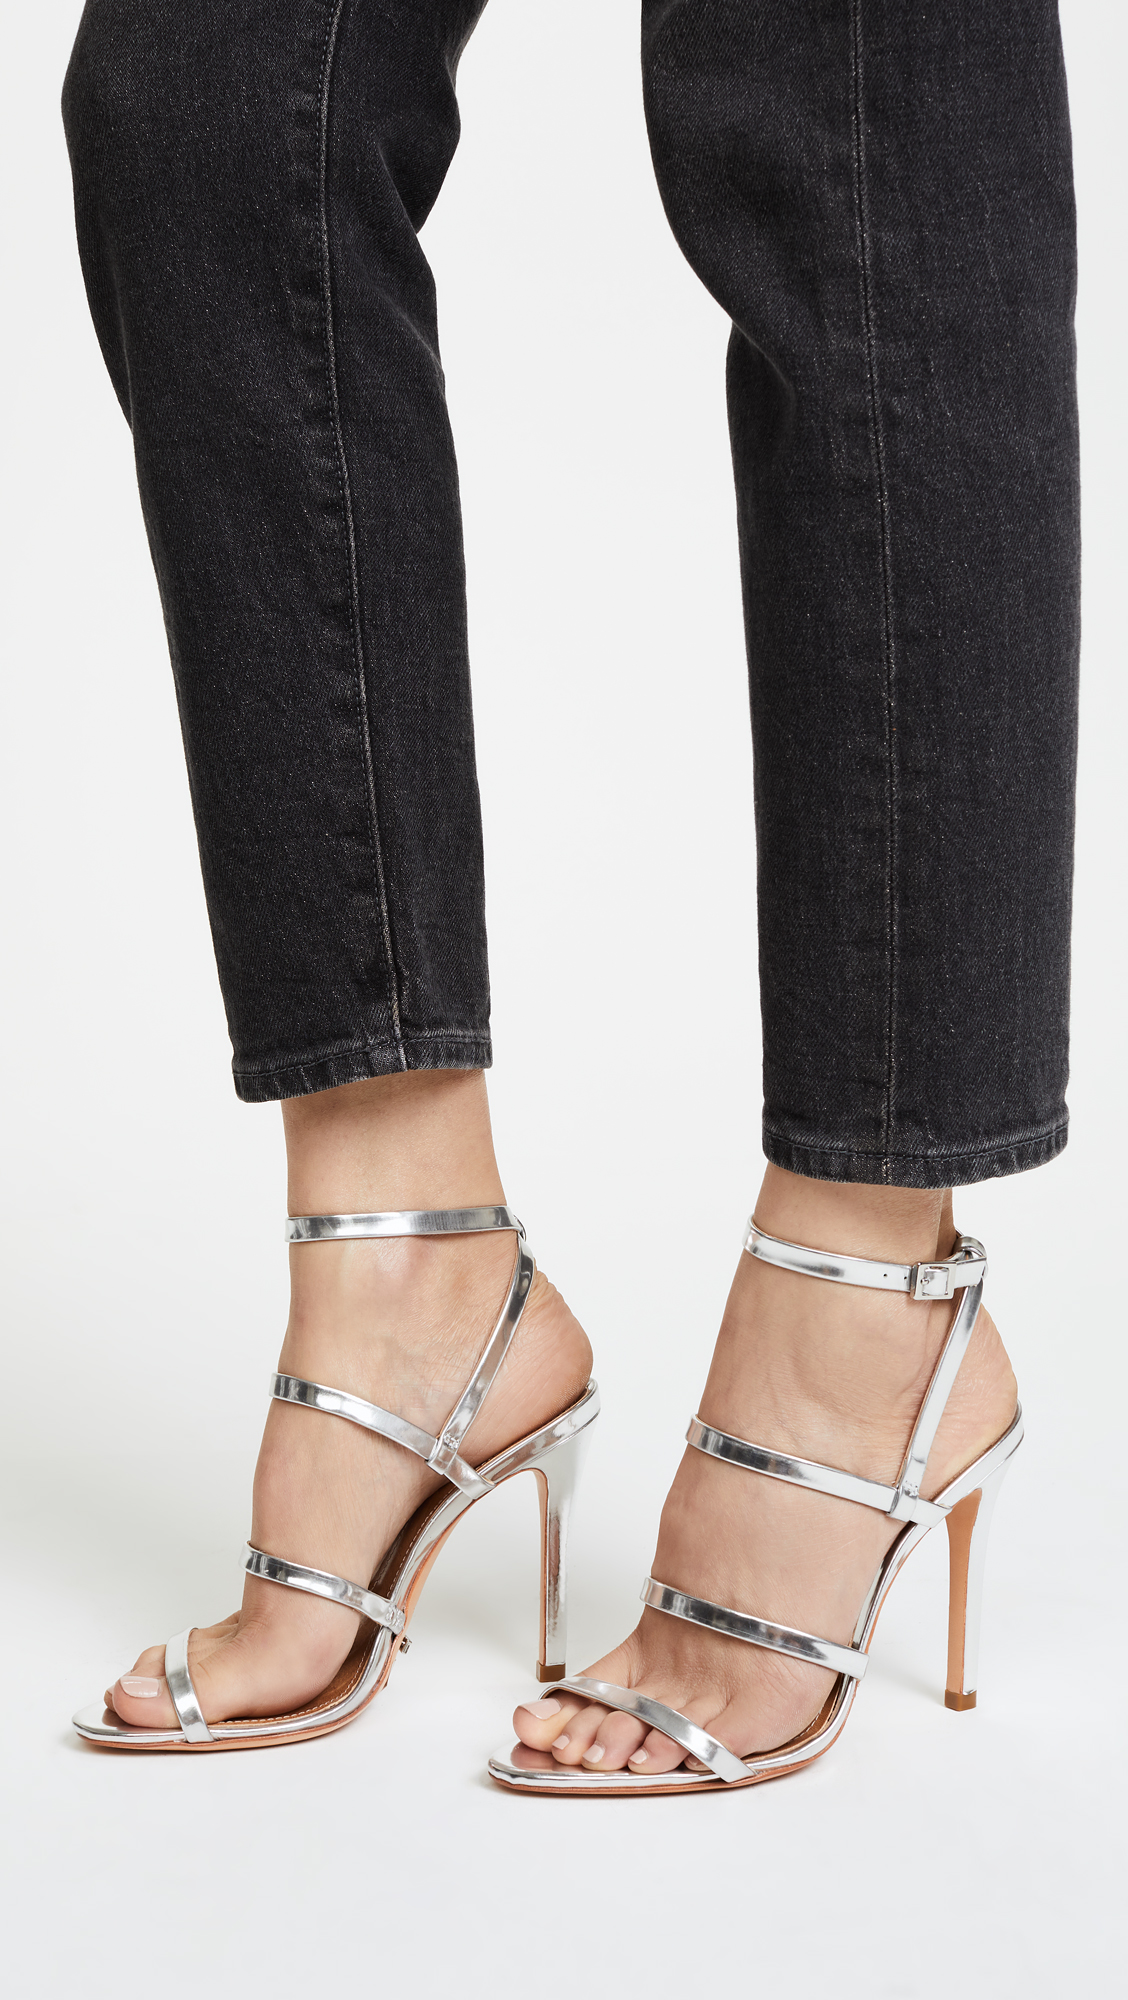 b23340a3439f Schutz Ilara Strappy Sandals